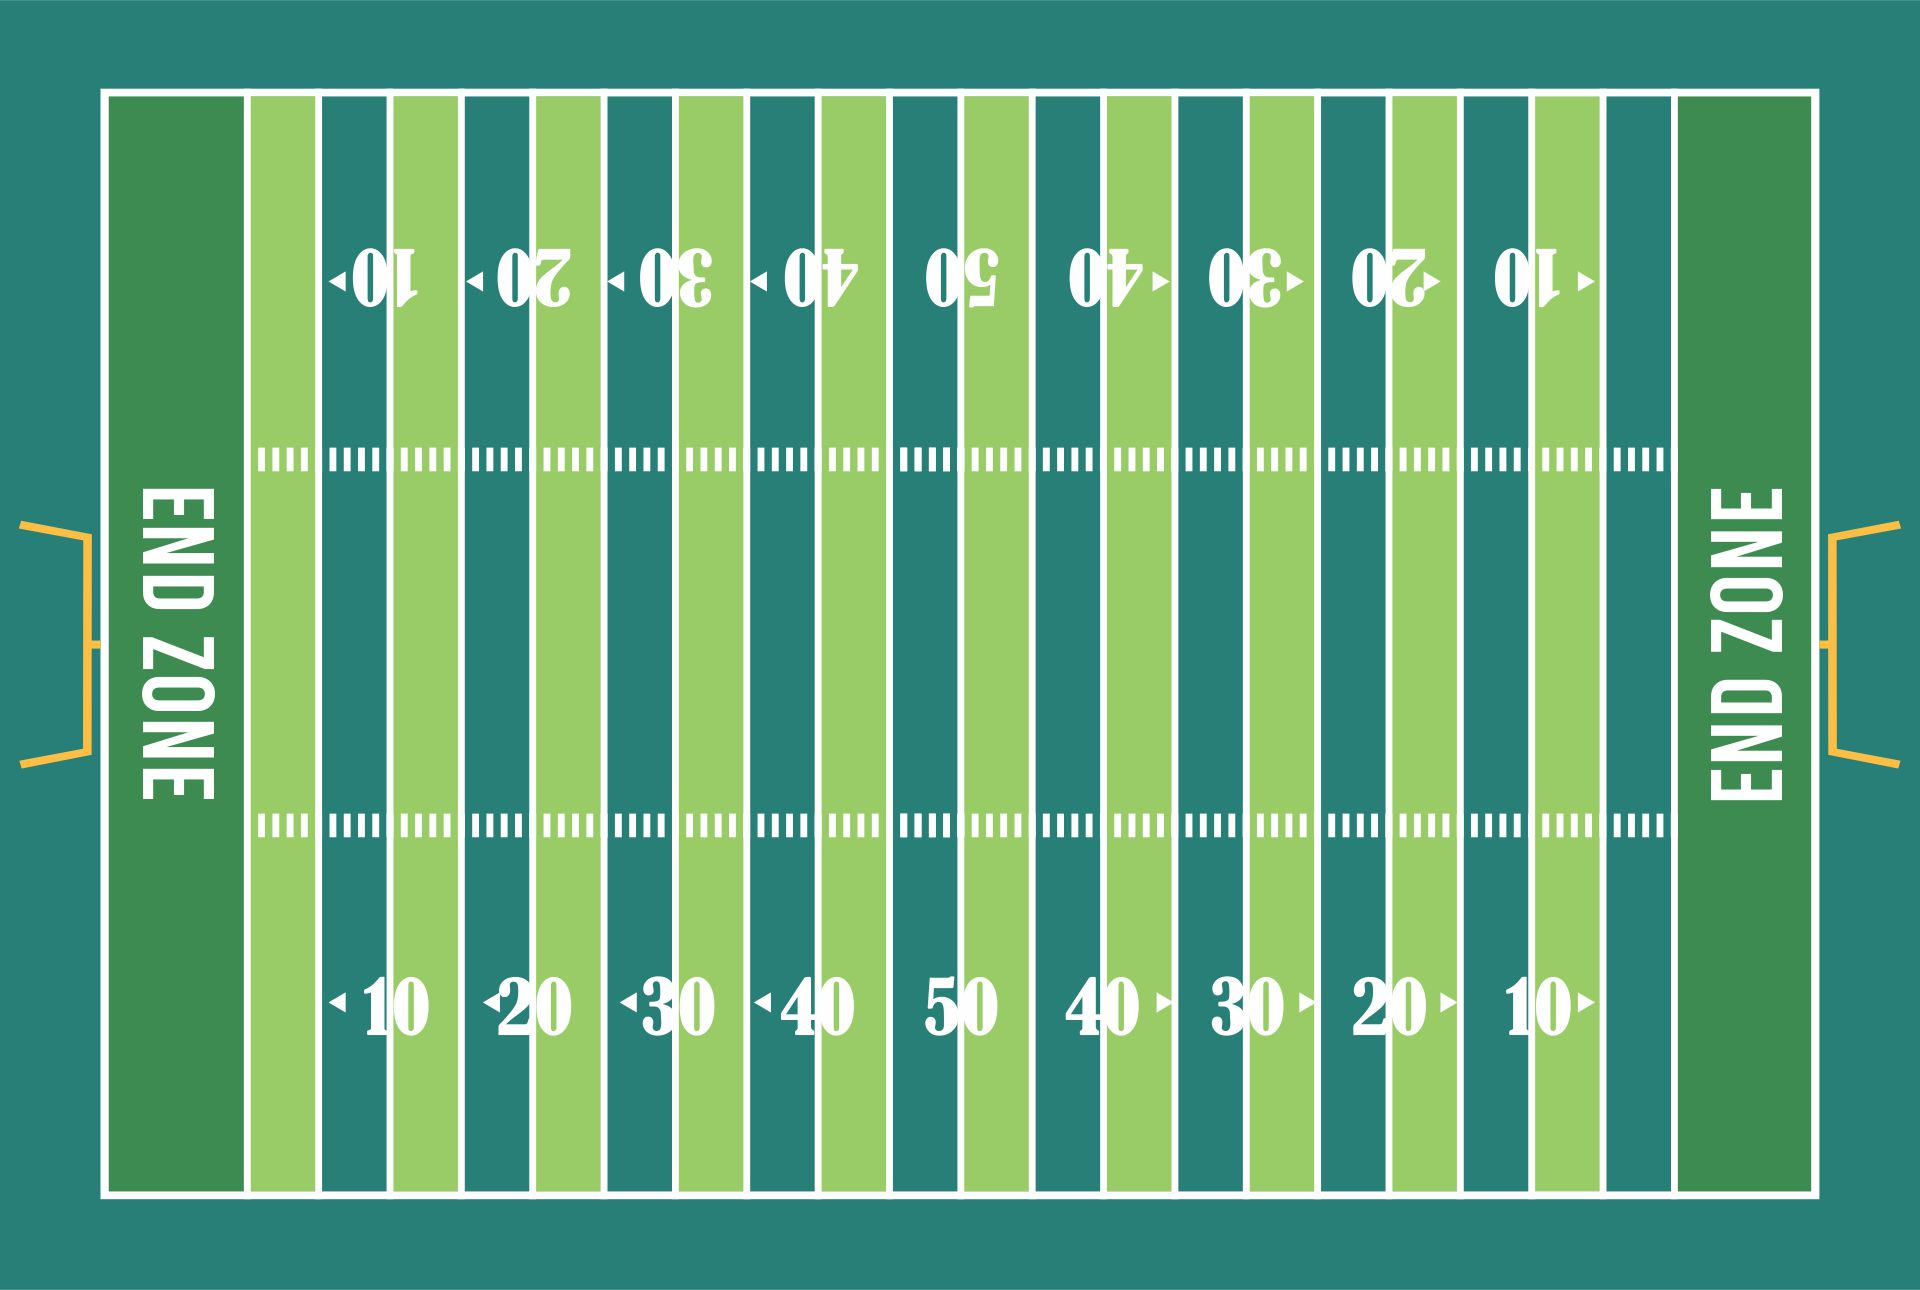 Football Field Diagram Printable